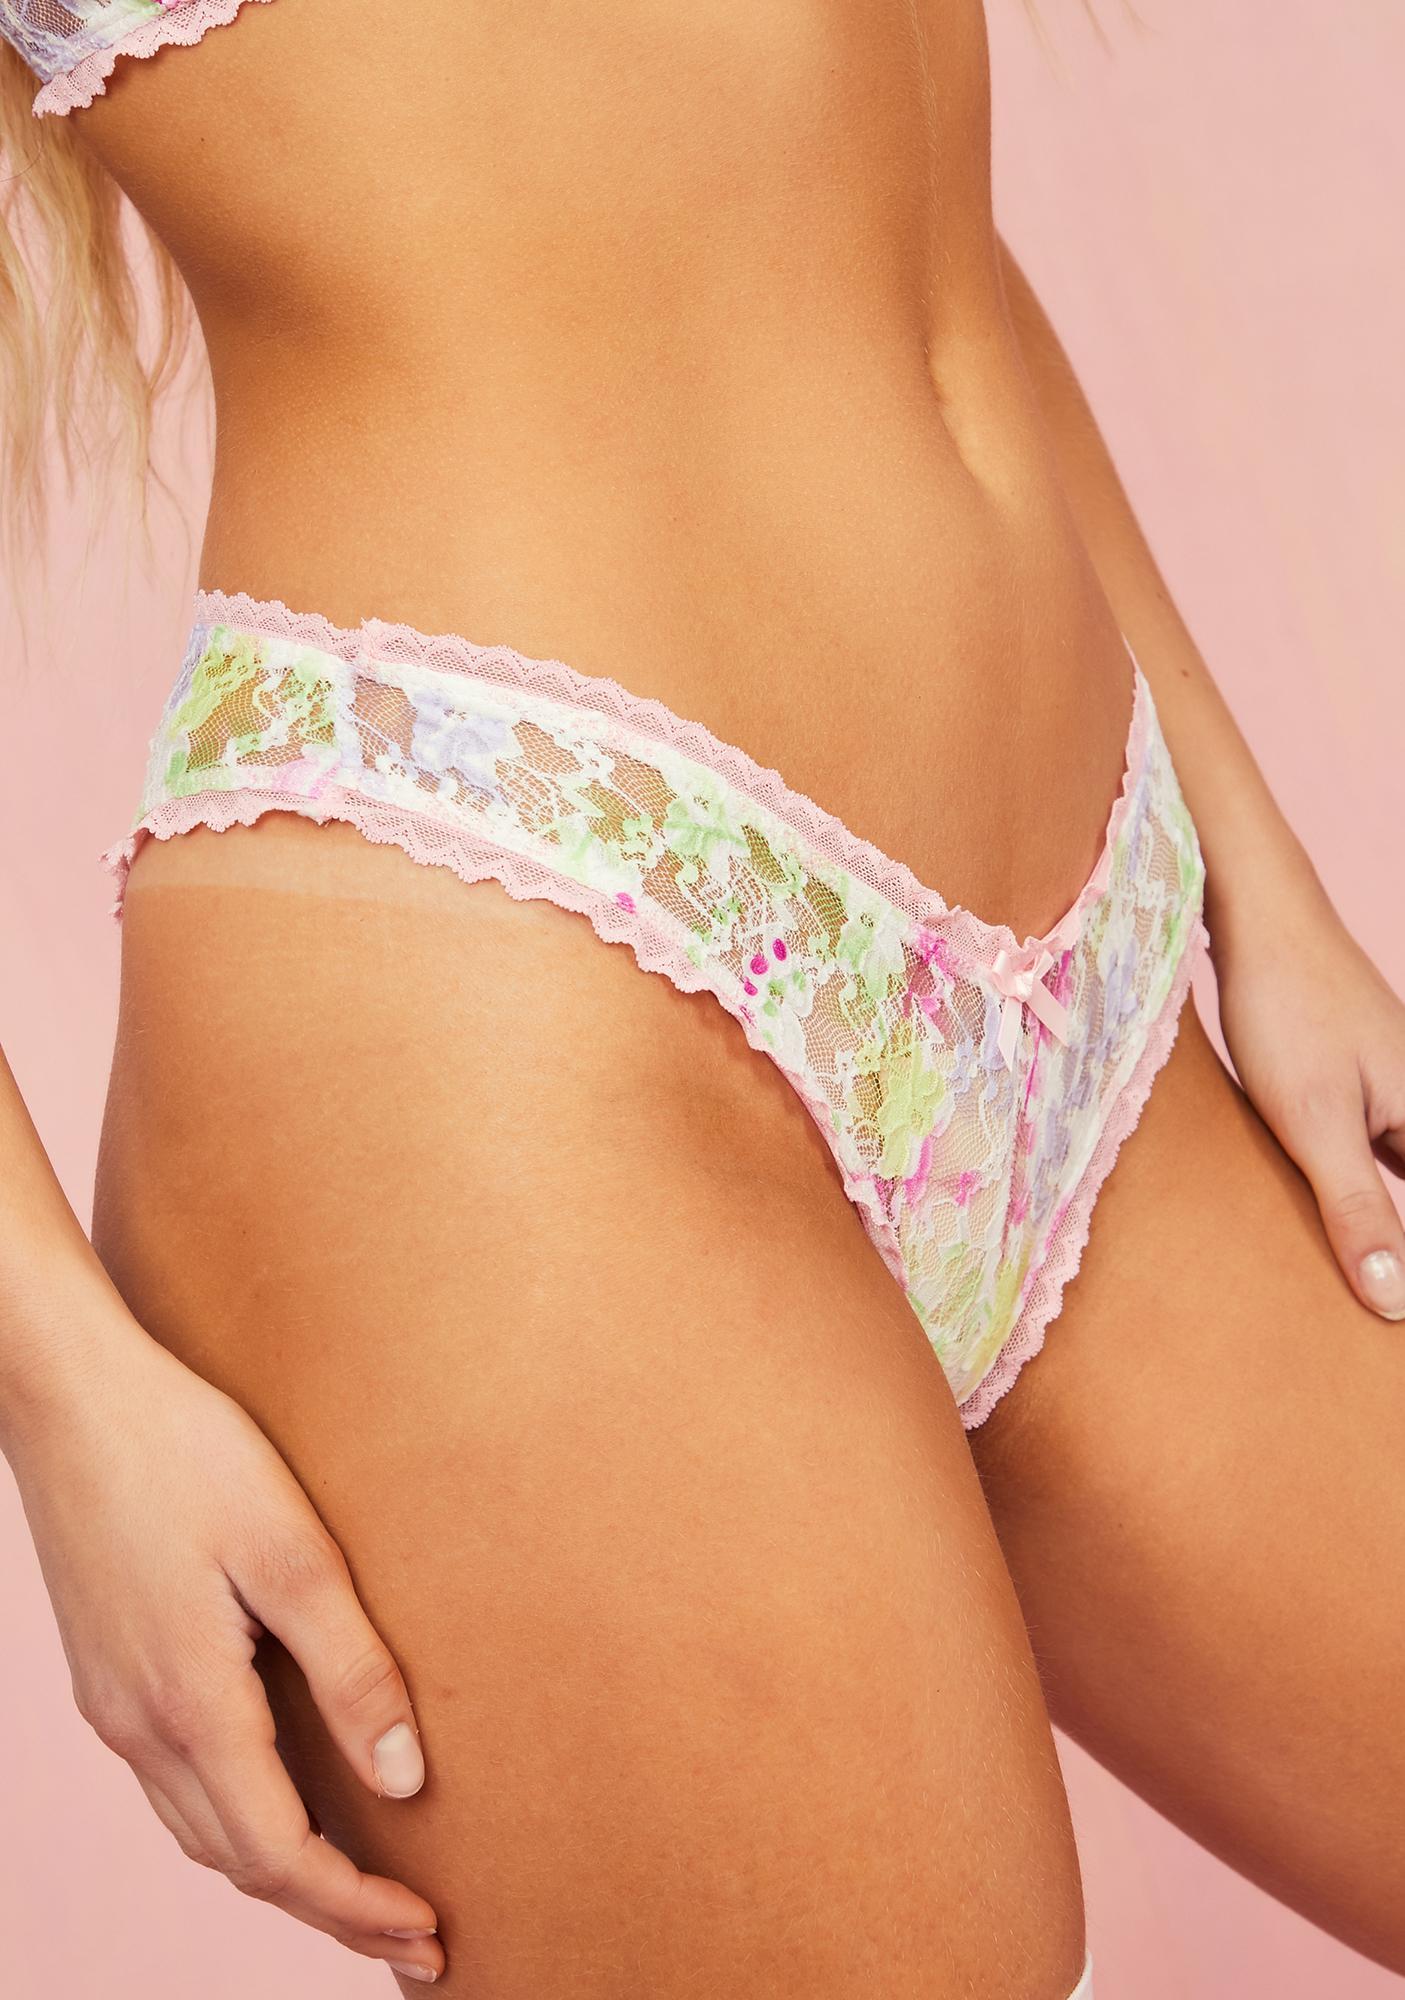 Sugar Thrillz Fairy Dreamhouse Lace Panties